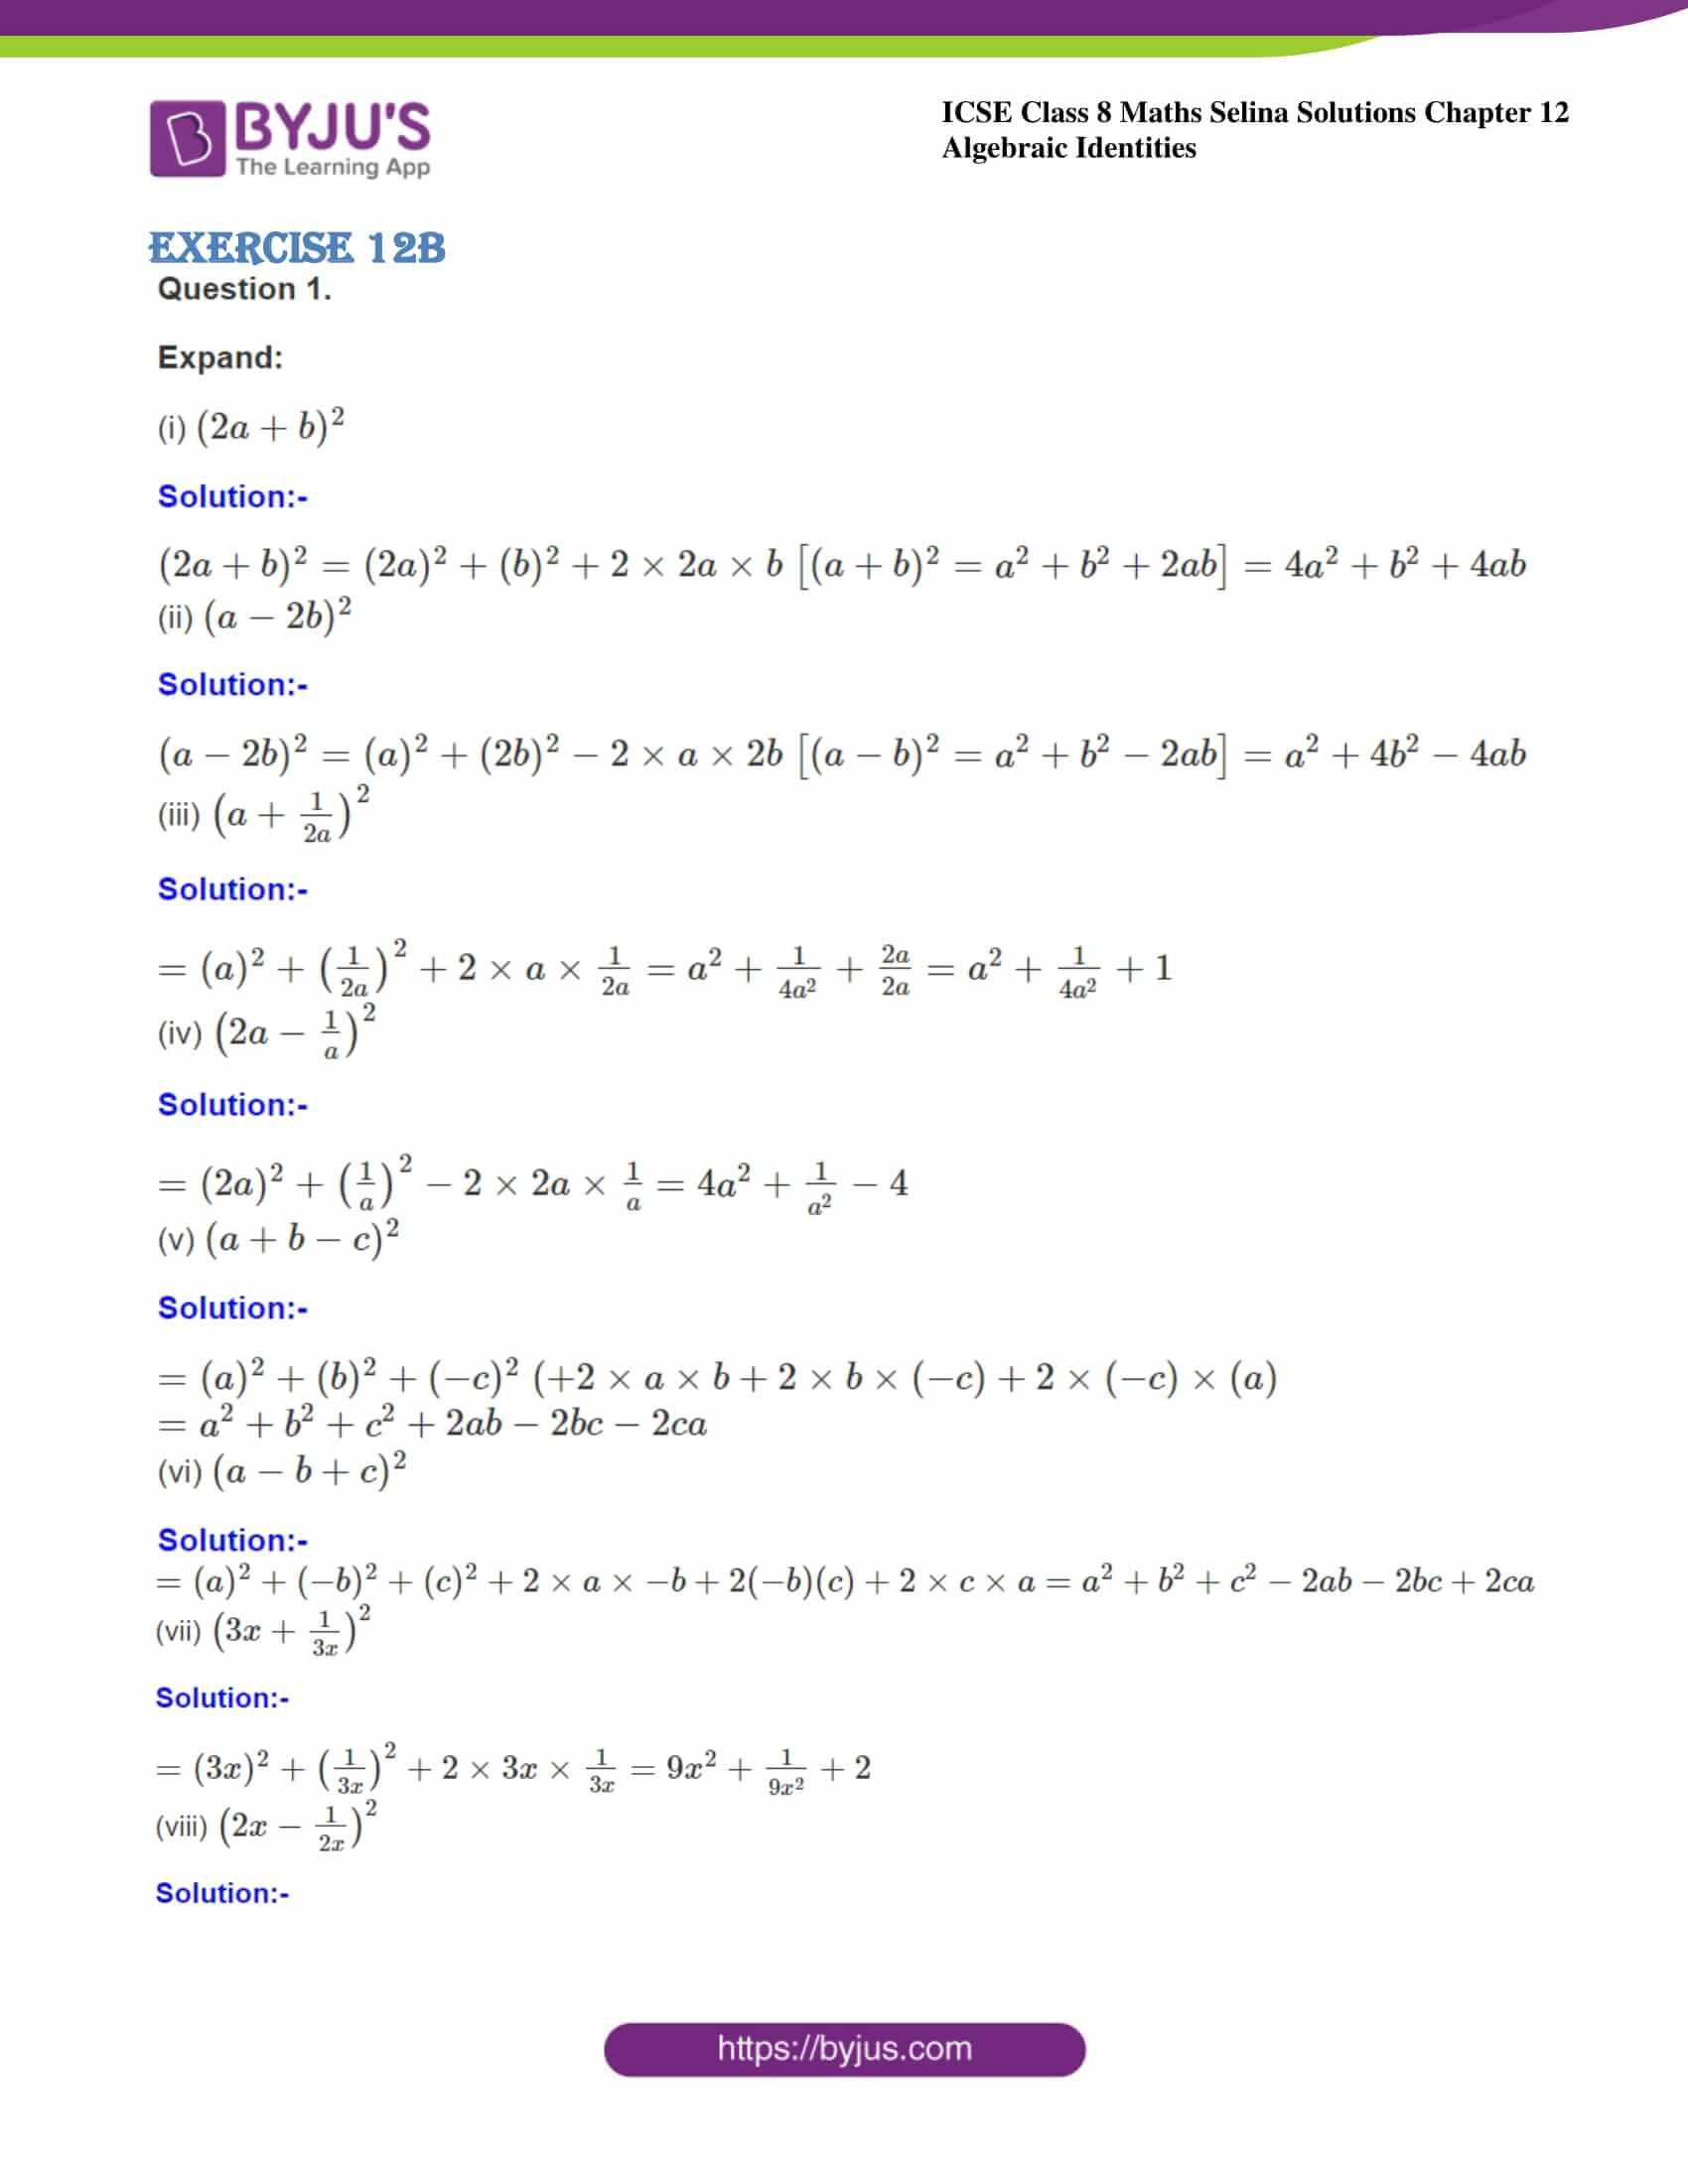 icse class 8 maths may3 selina solutions chapter 12 algebraic identities 06